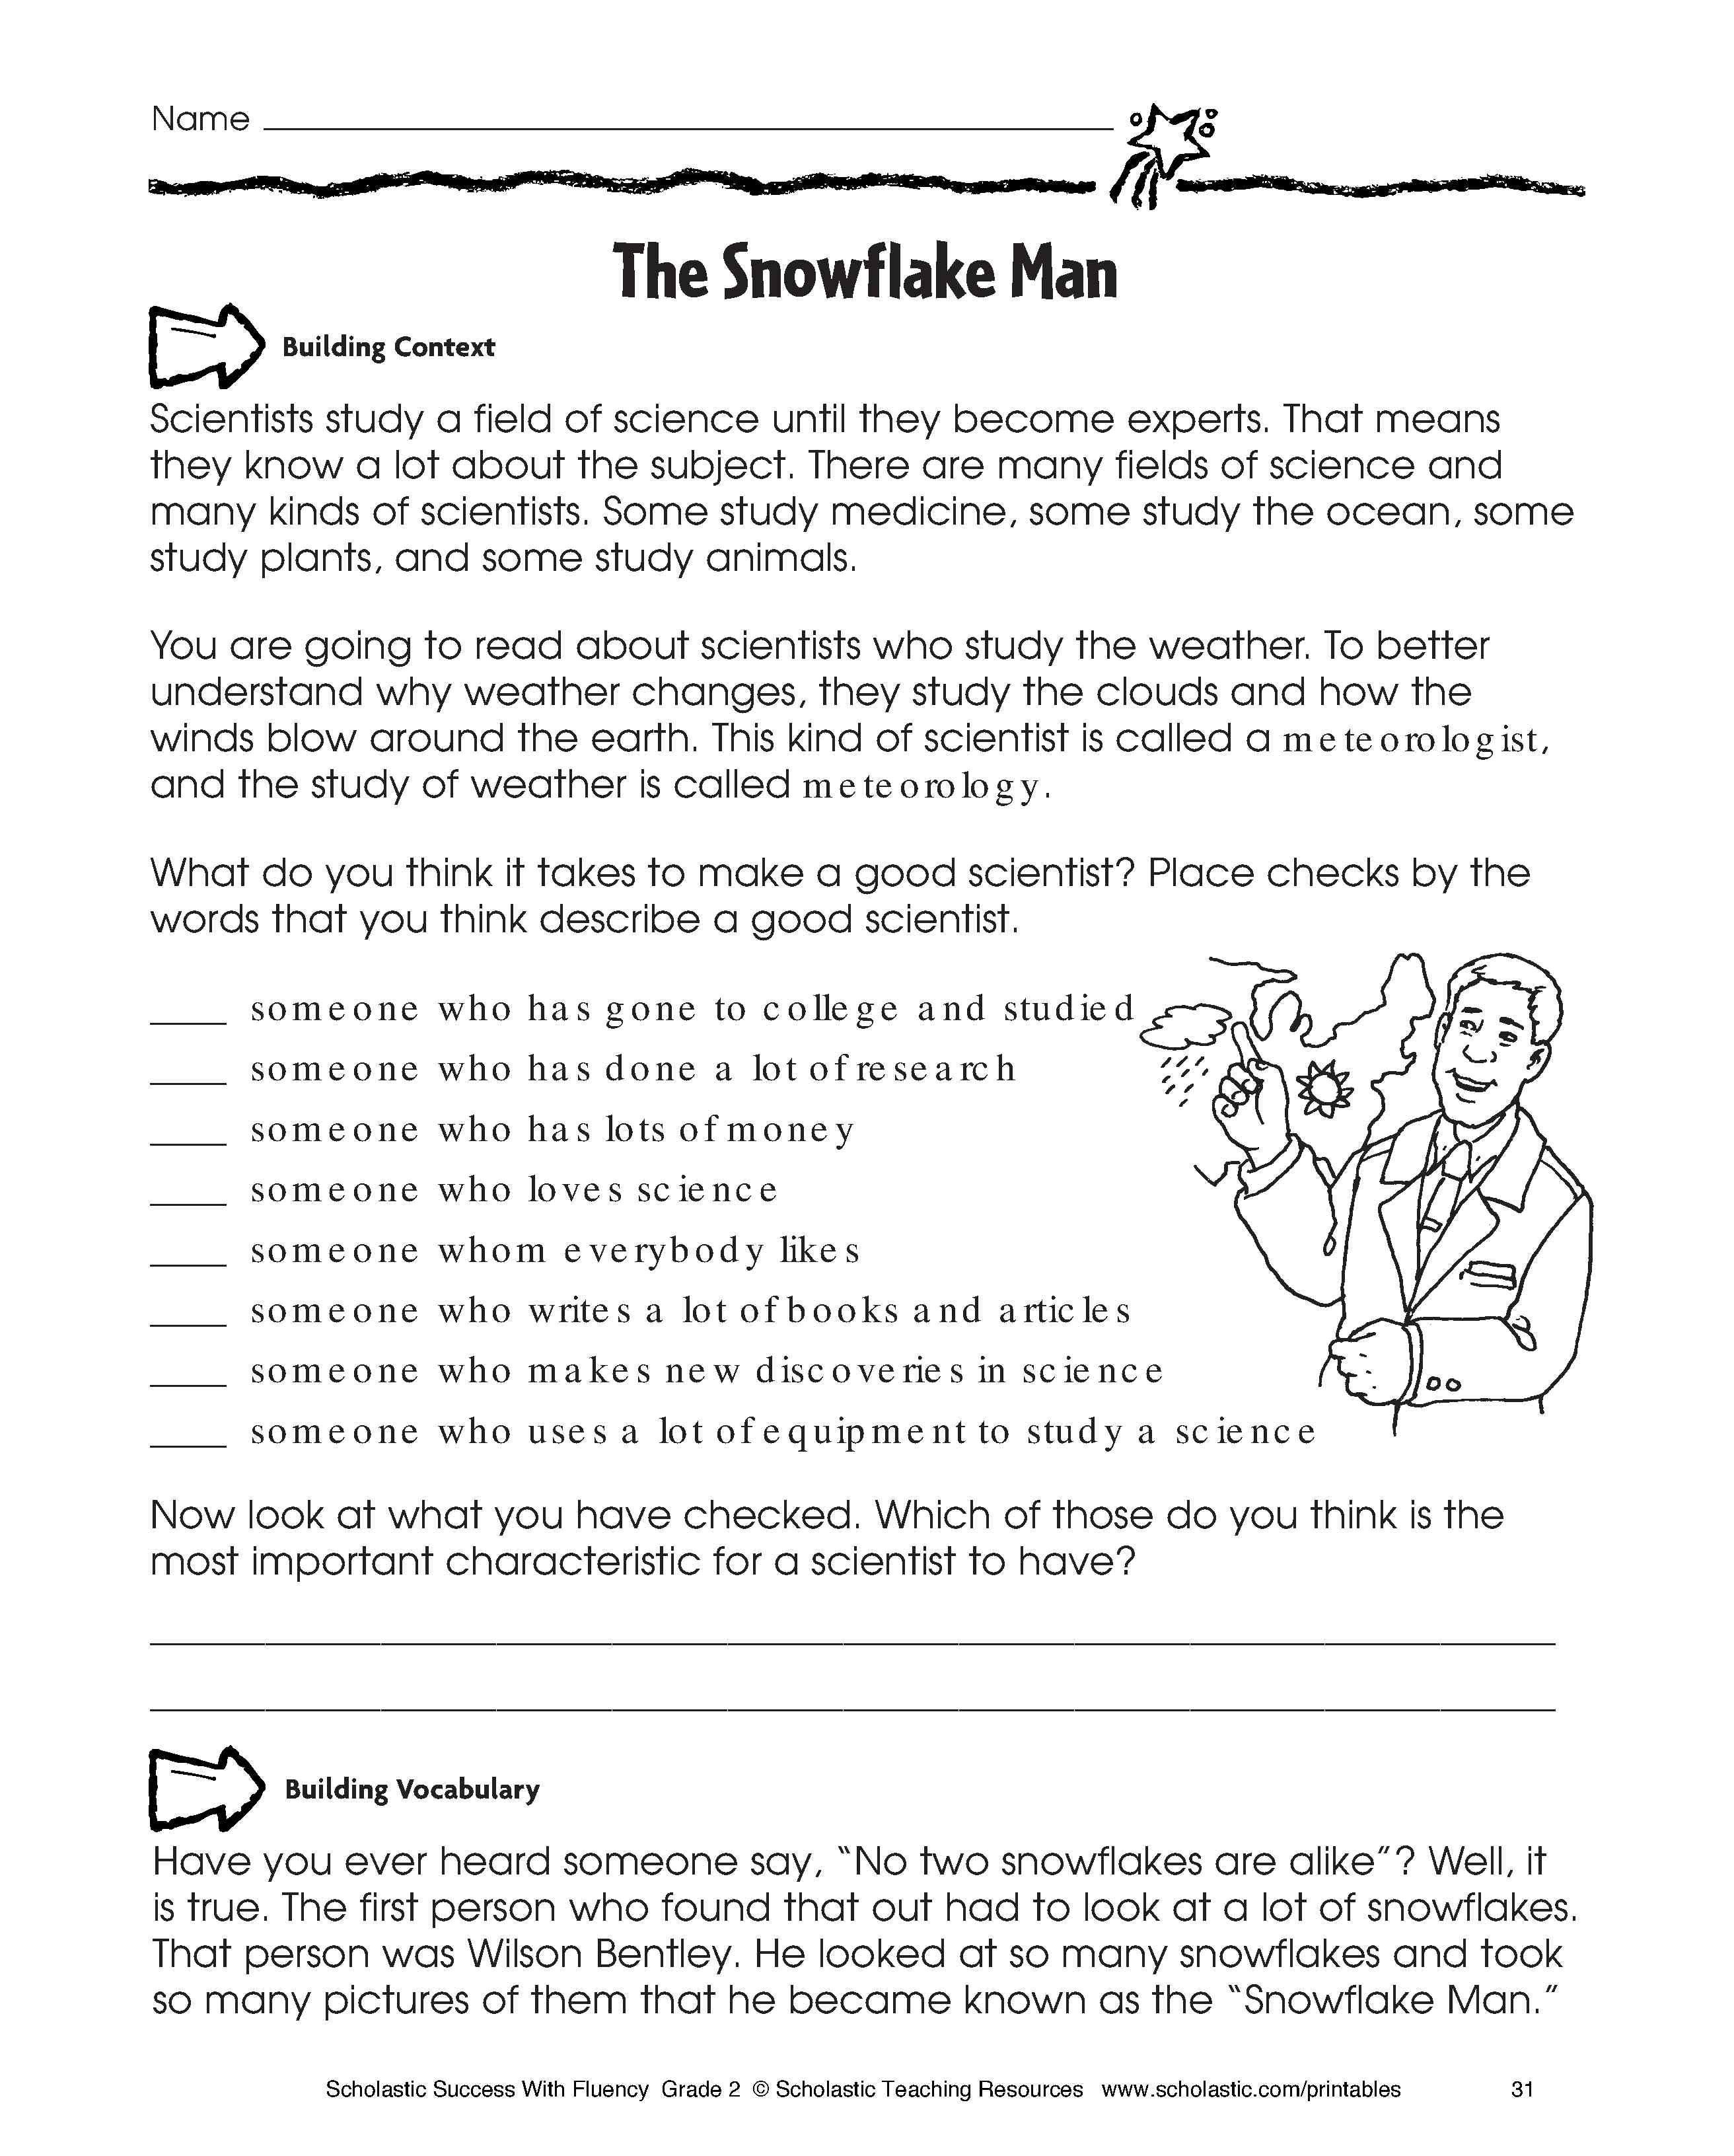 Free Printable 4th Grade Reading Worksheets